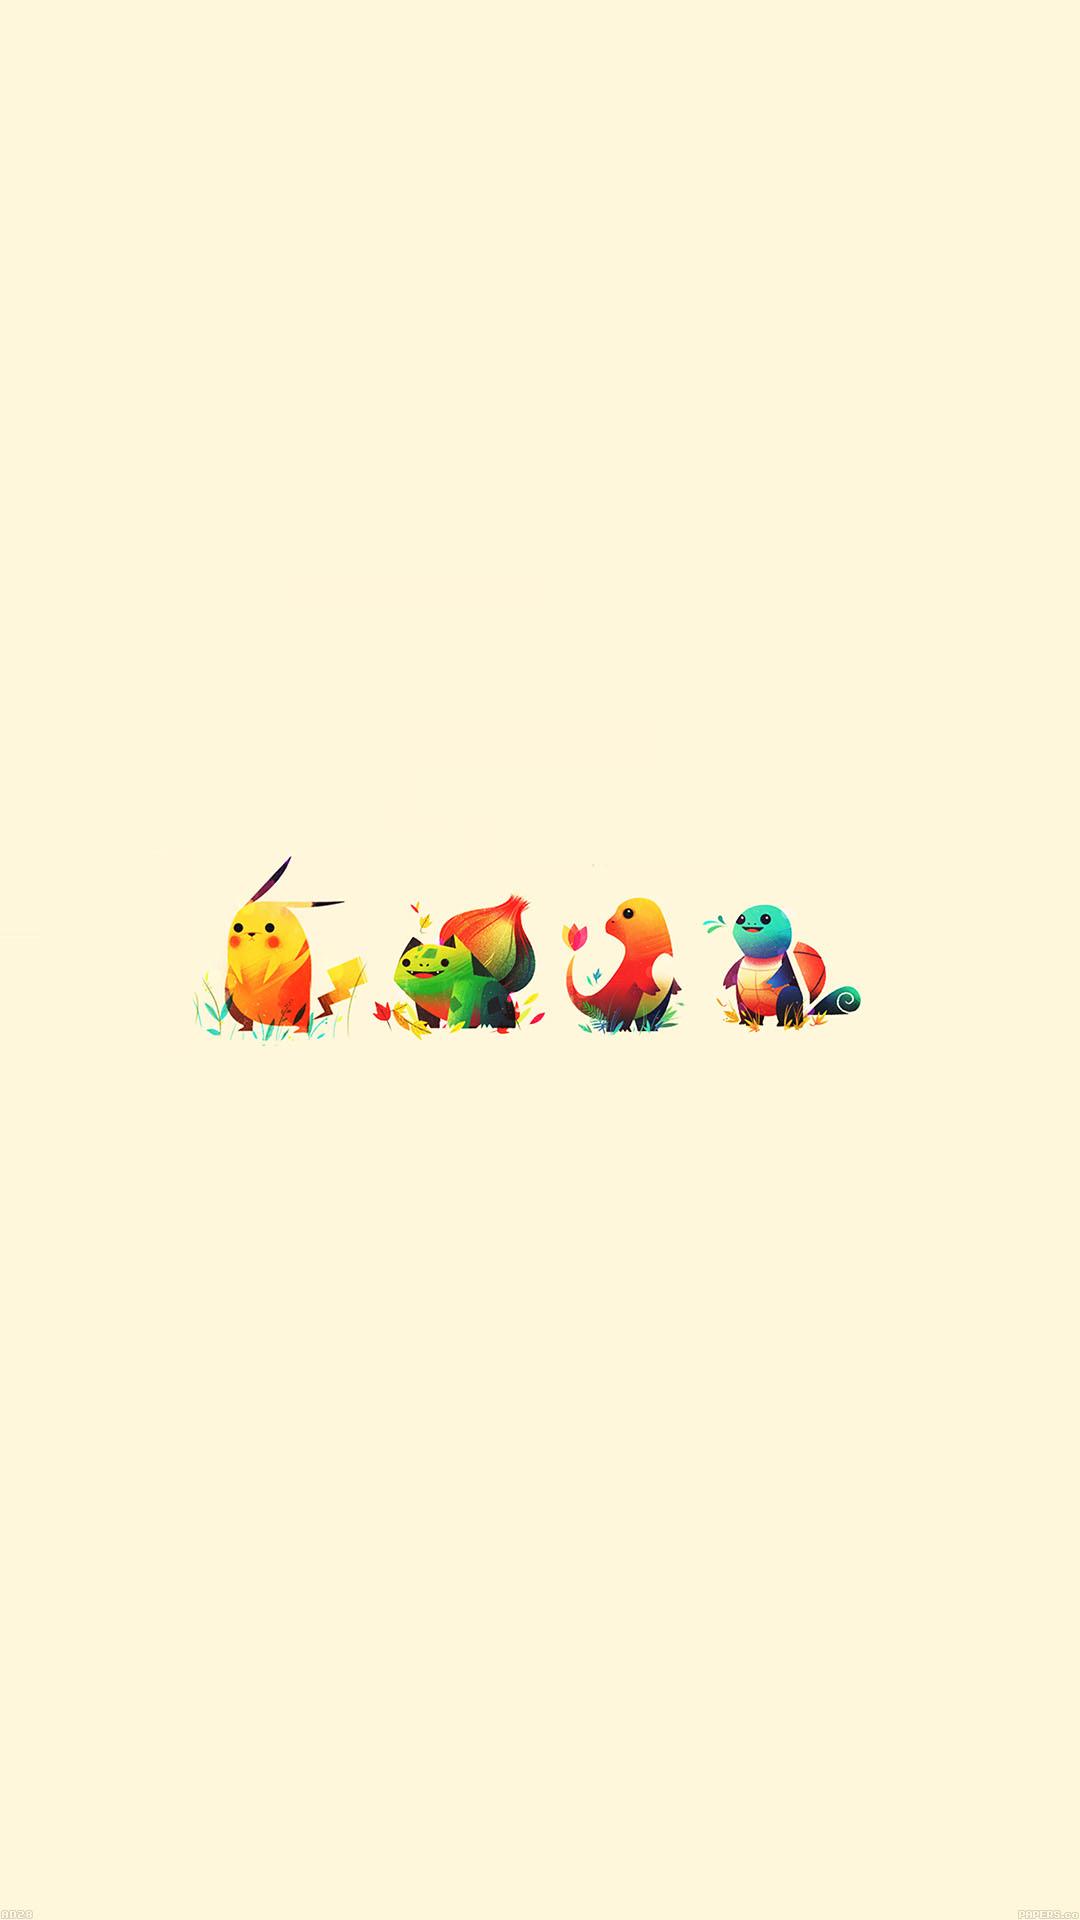 Gravity Falls Iphone 7 Plus Wallpaper Ad28 Cute Pokemon Illust Papers Co